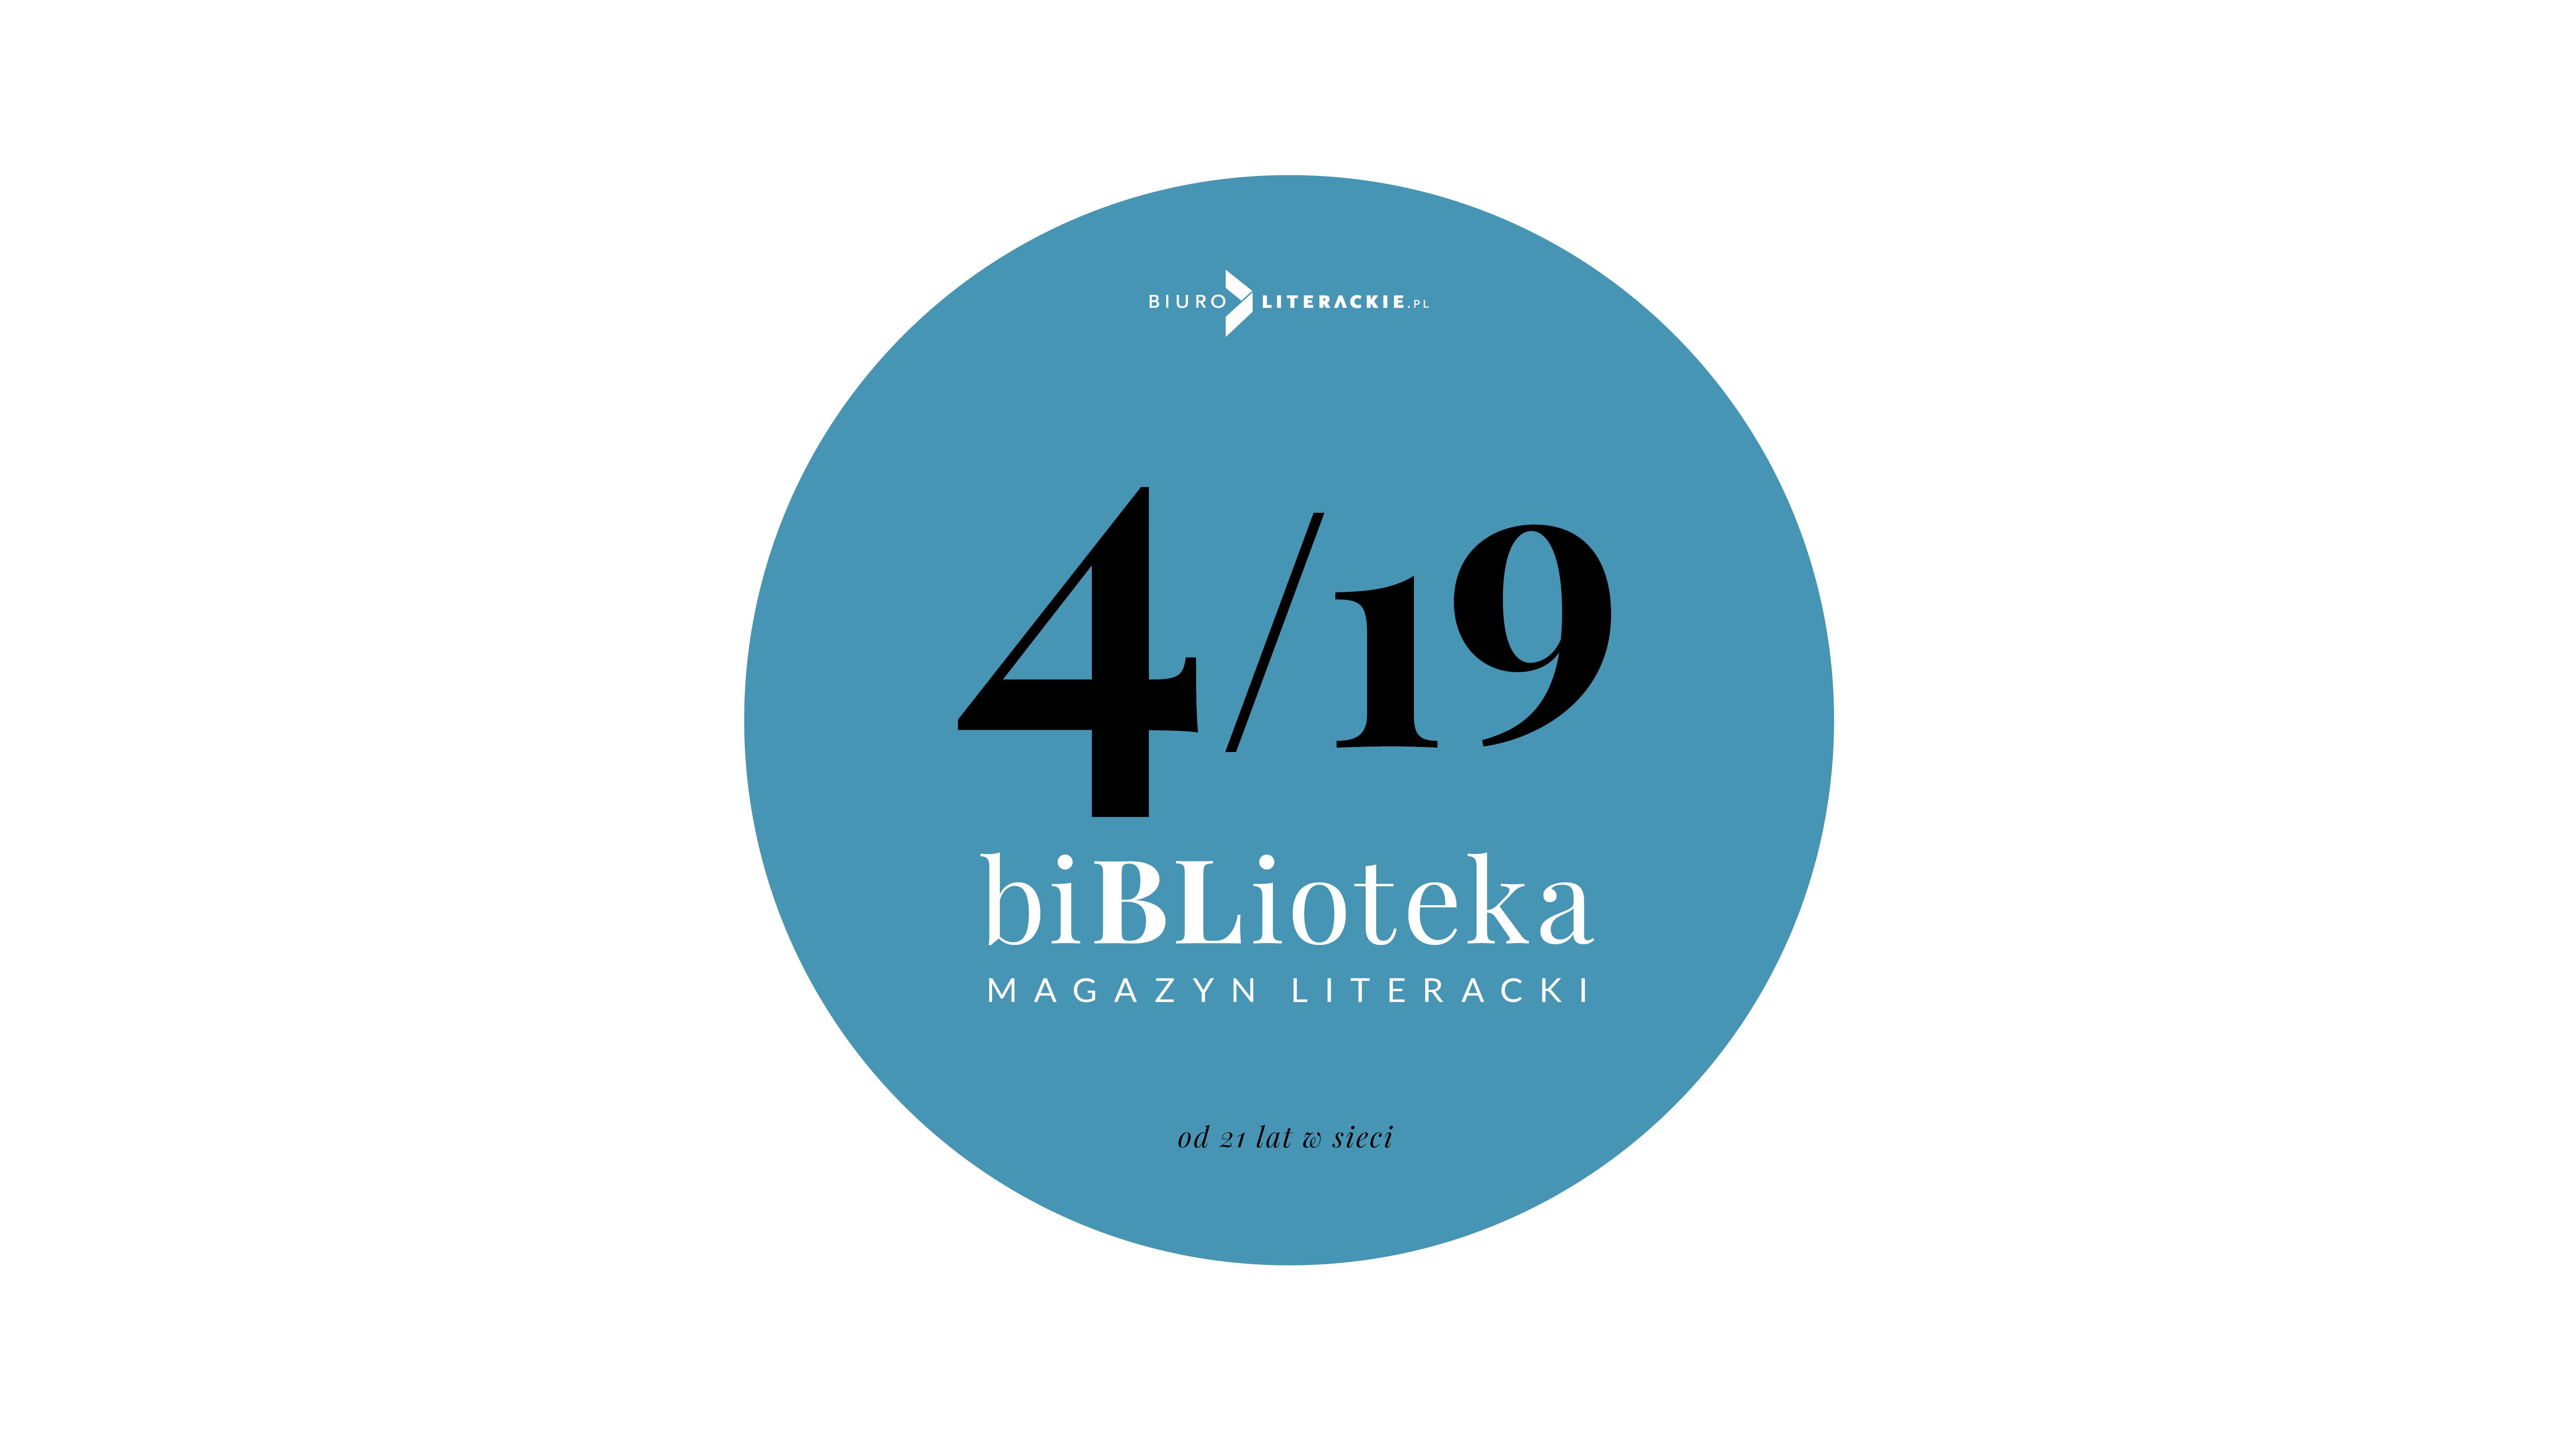 BL Info 2019.03.12 biBLioteka nr 4 2019__www_top